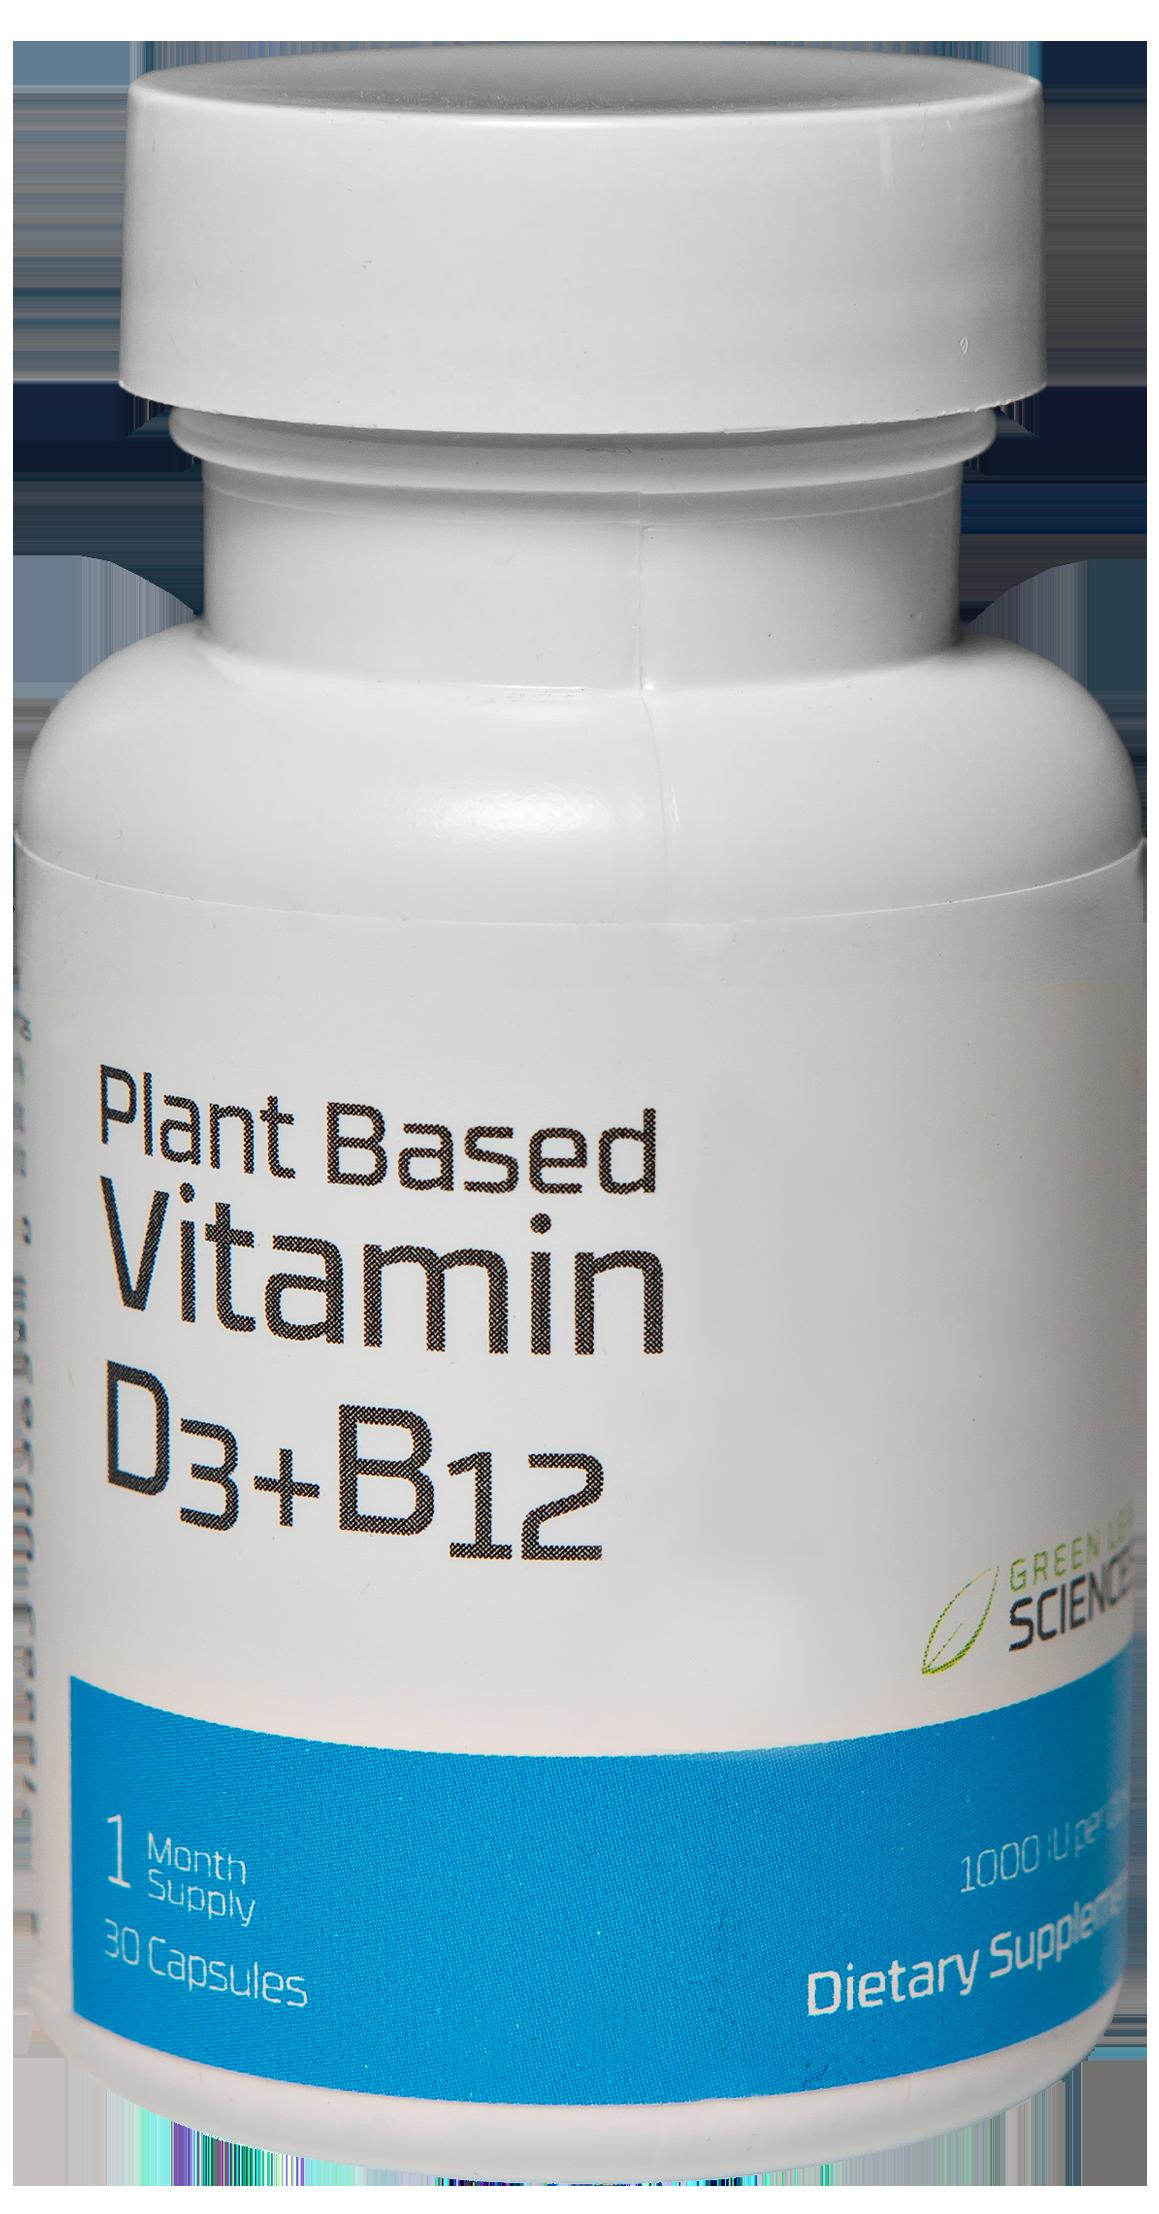 Vitamin D3 plus B12 bottle